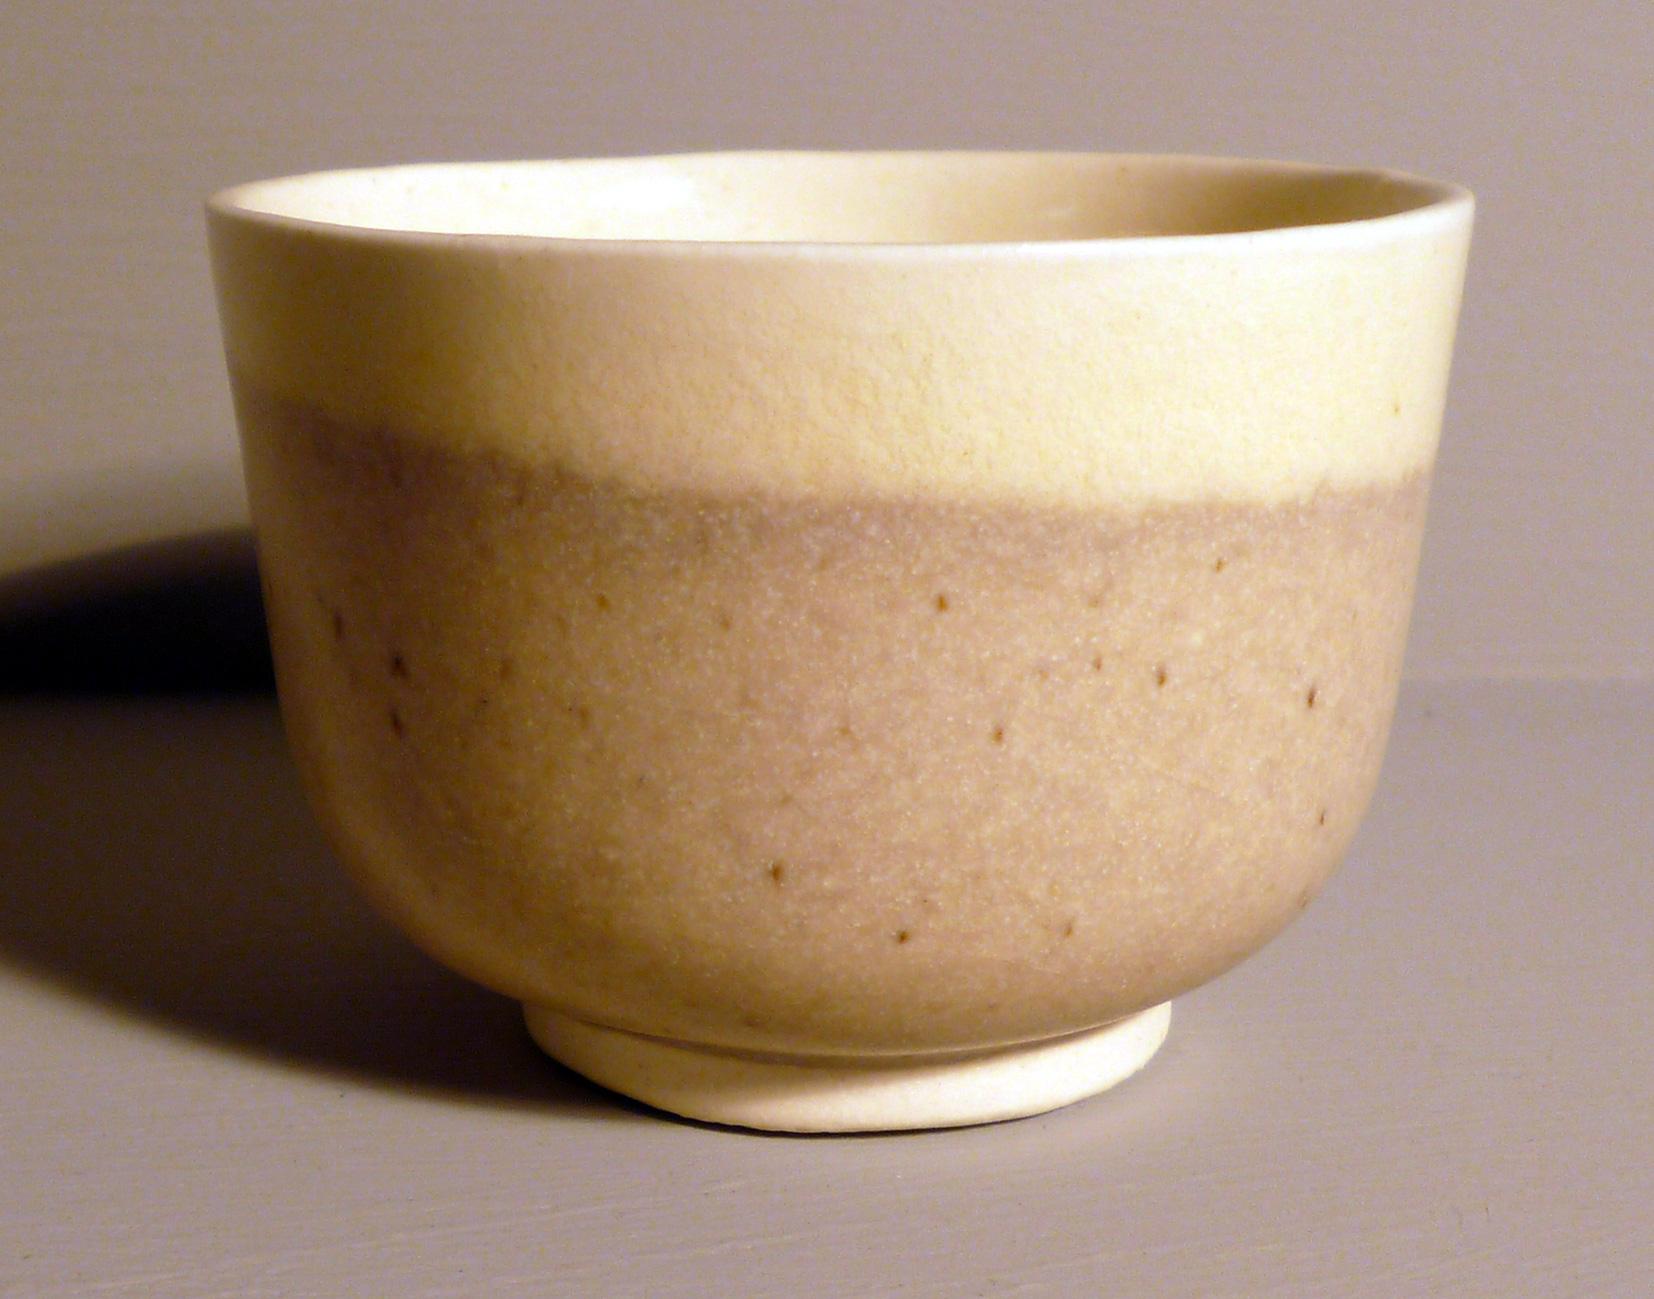 Small-Bell-Bowl-5cm-x-7.5cm in Ochre